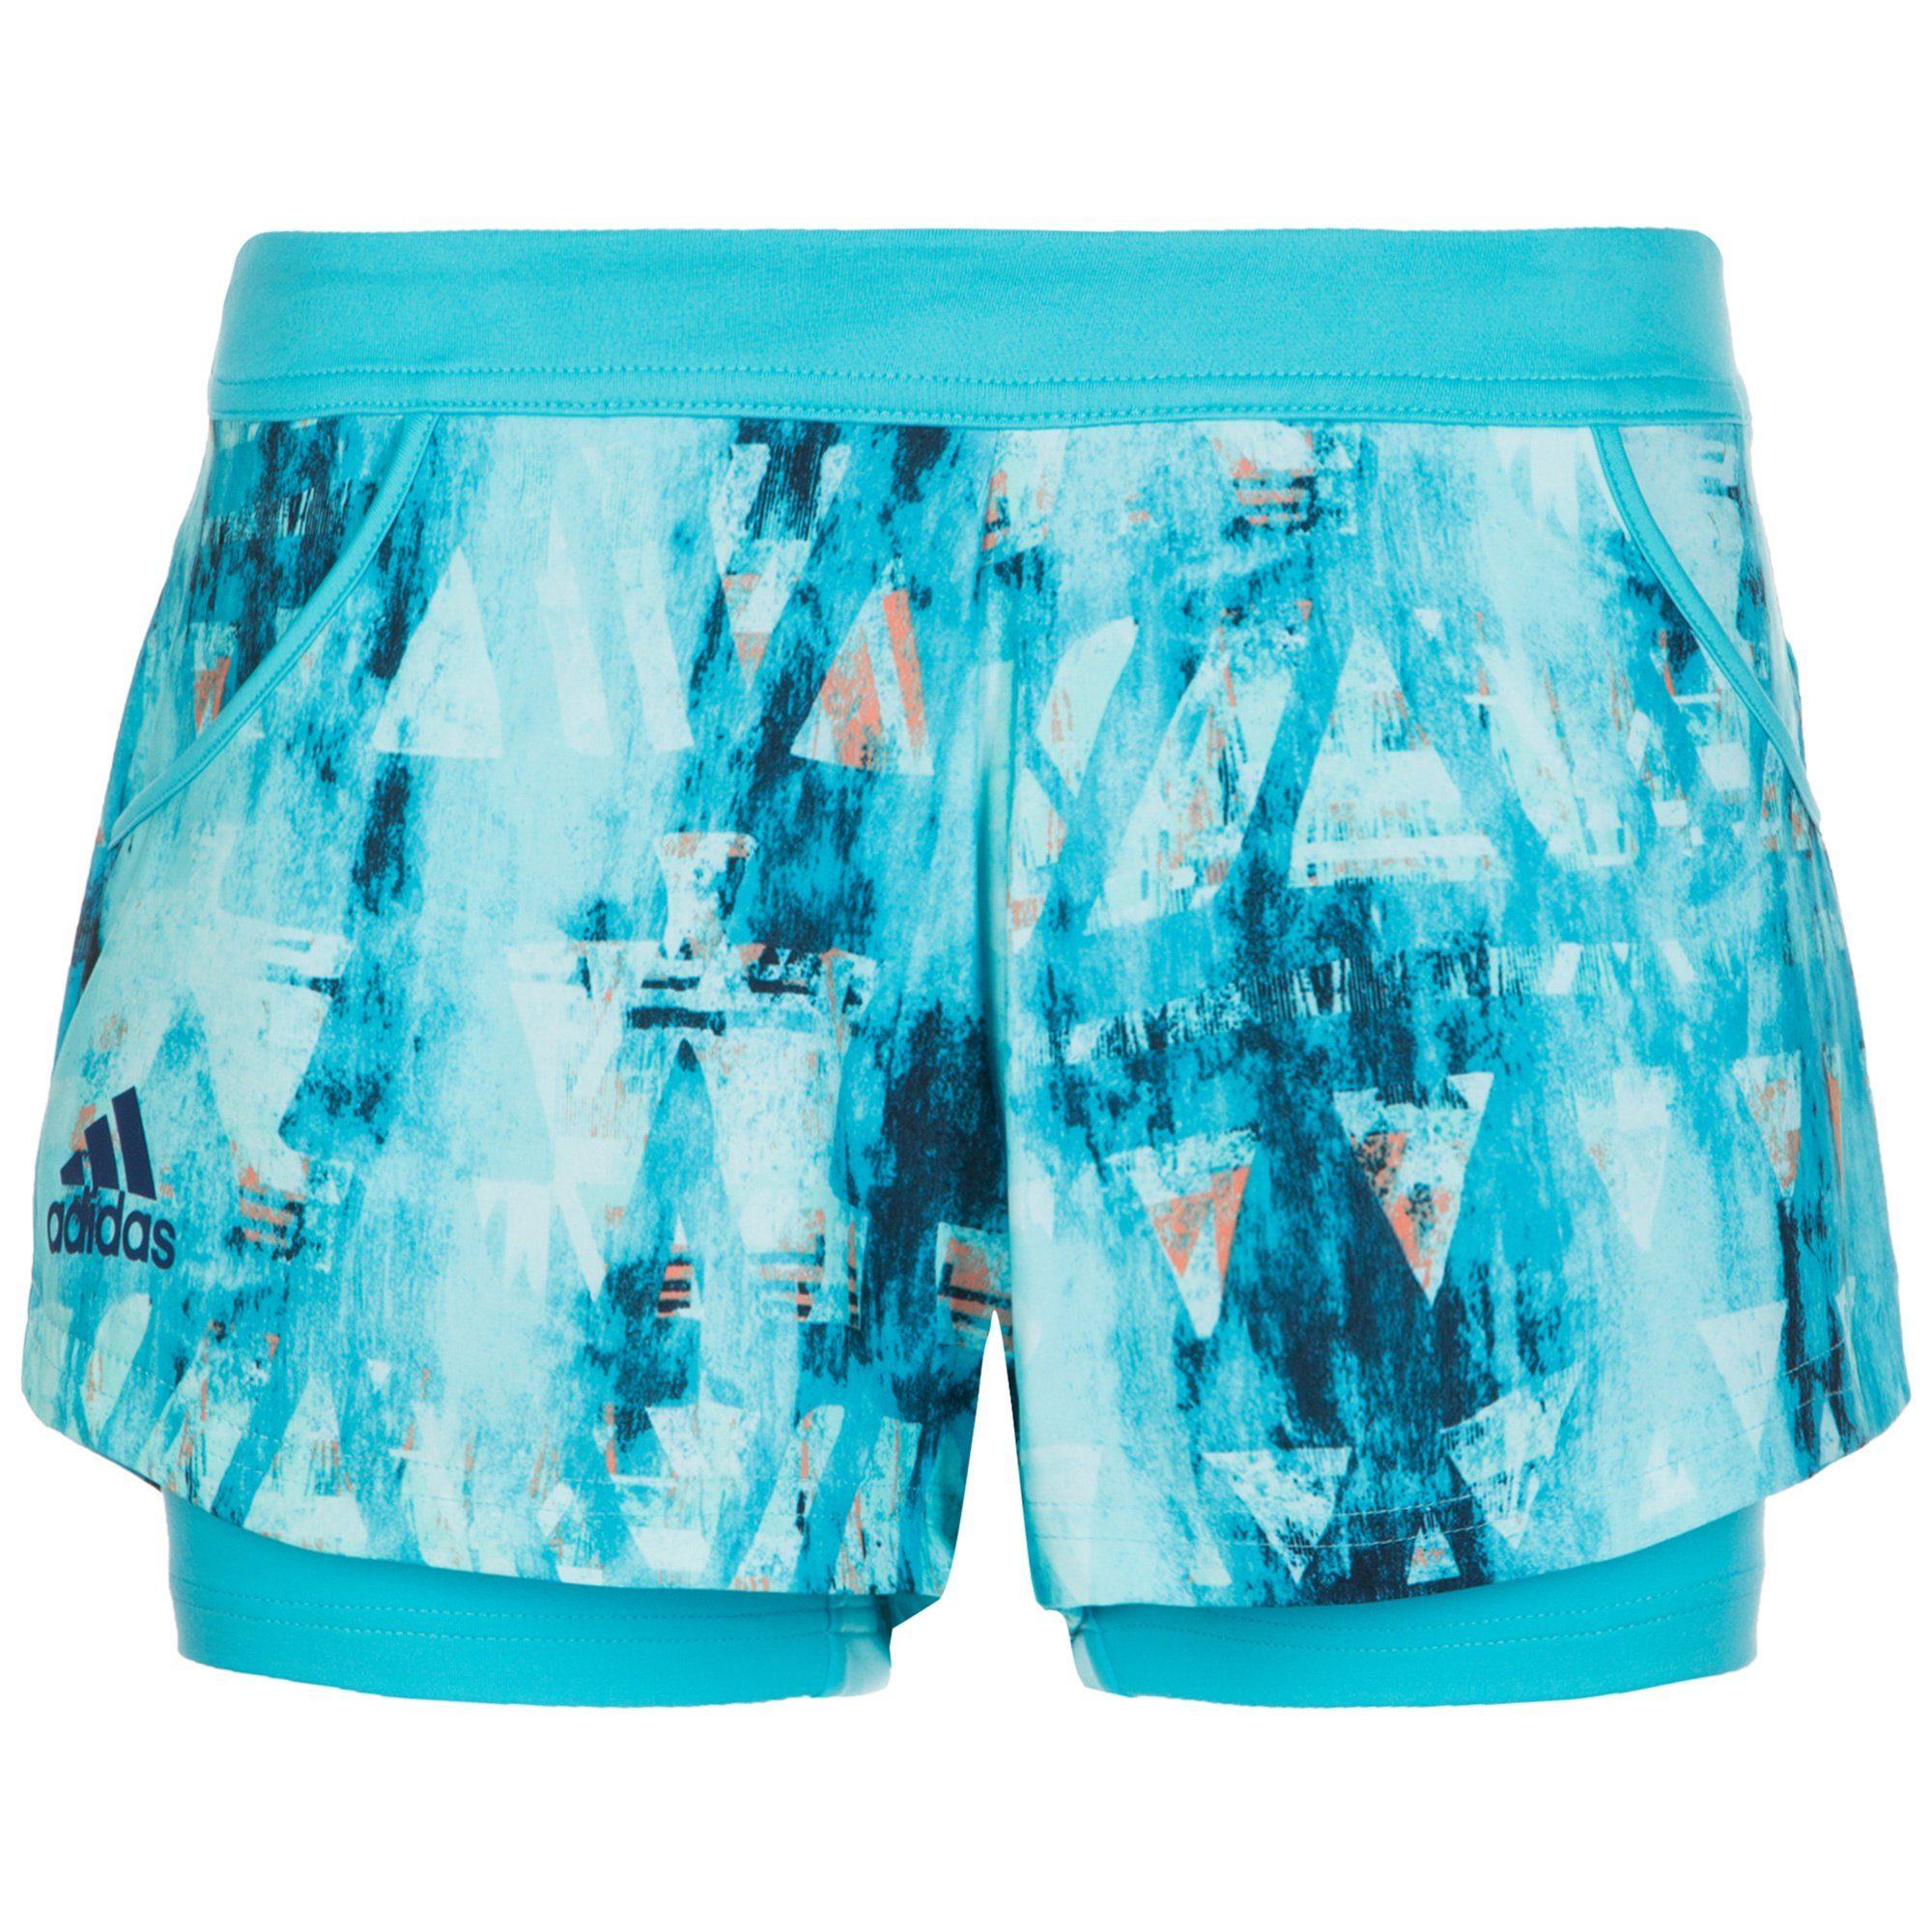 adidas Performance Melbourne Tennisshort Damen | Sportbekleidung > Sporthosen > Tennisshorts | Blau | Polyester - Elasthan | Adidas Performance